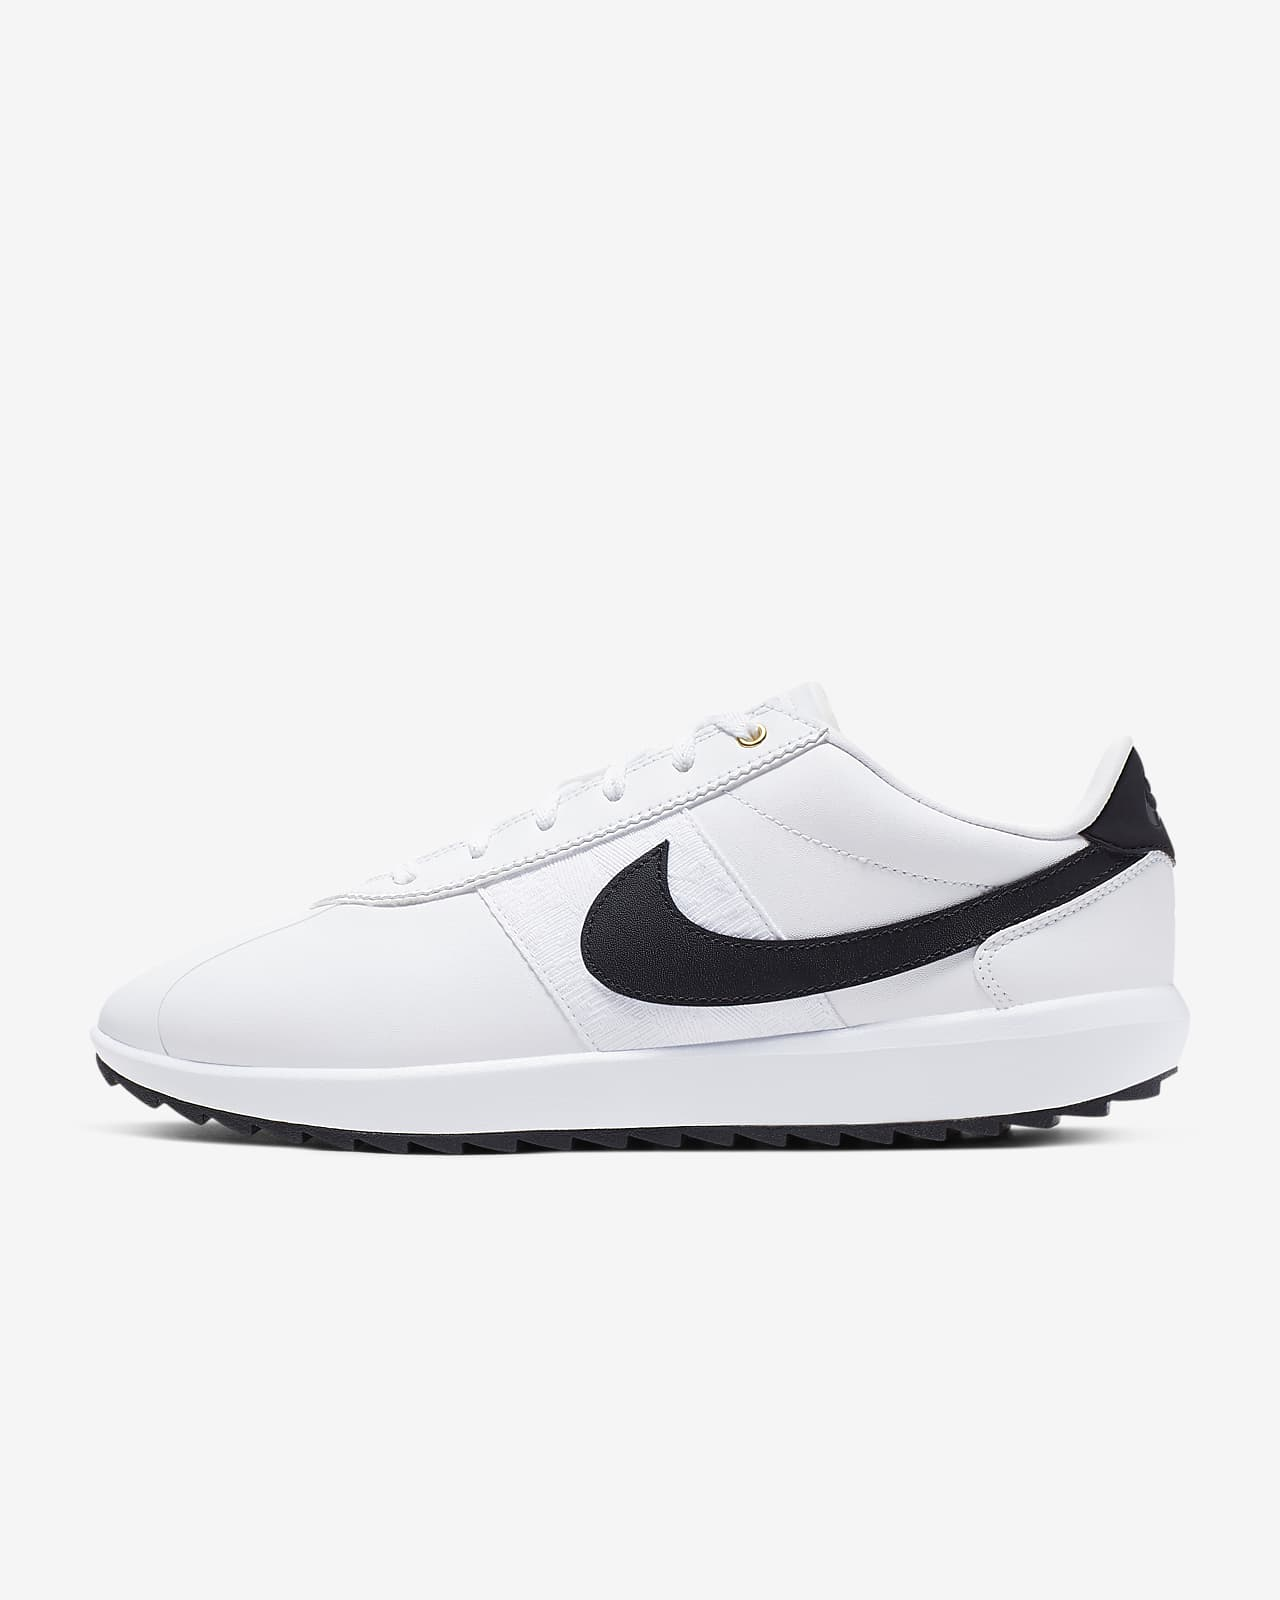 Nike Cortez G Women's Golf Shoe. Nike SA